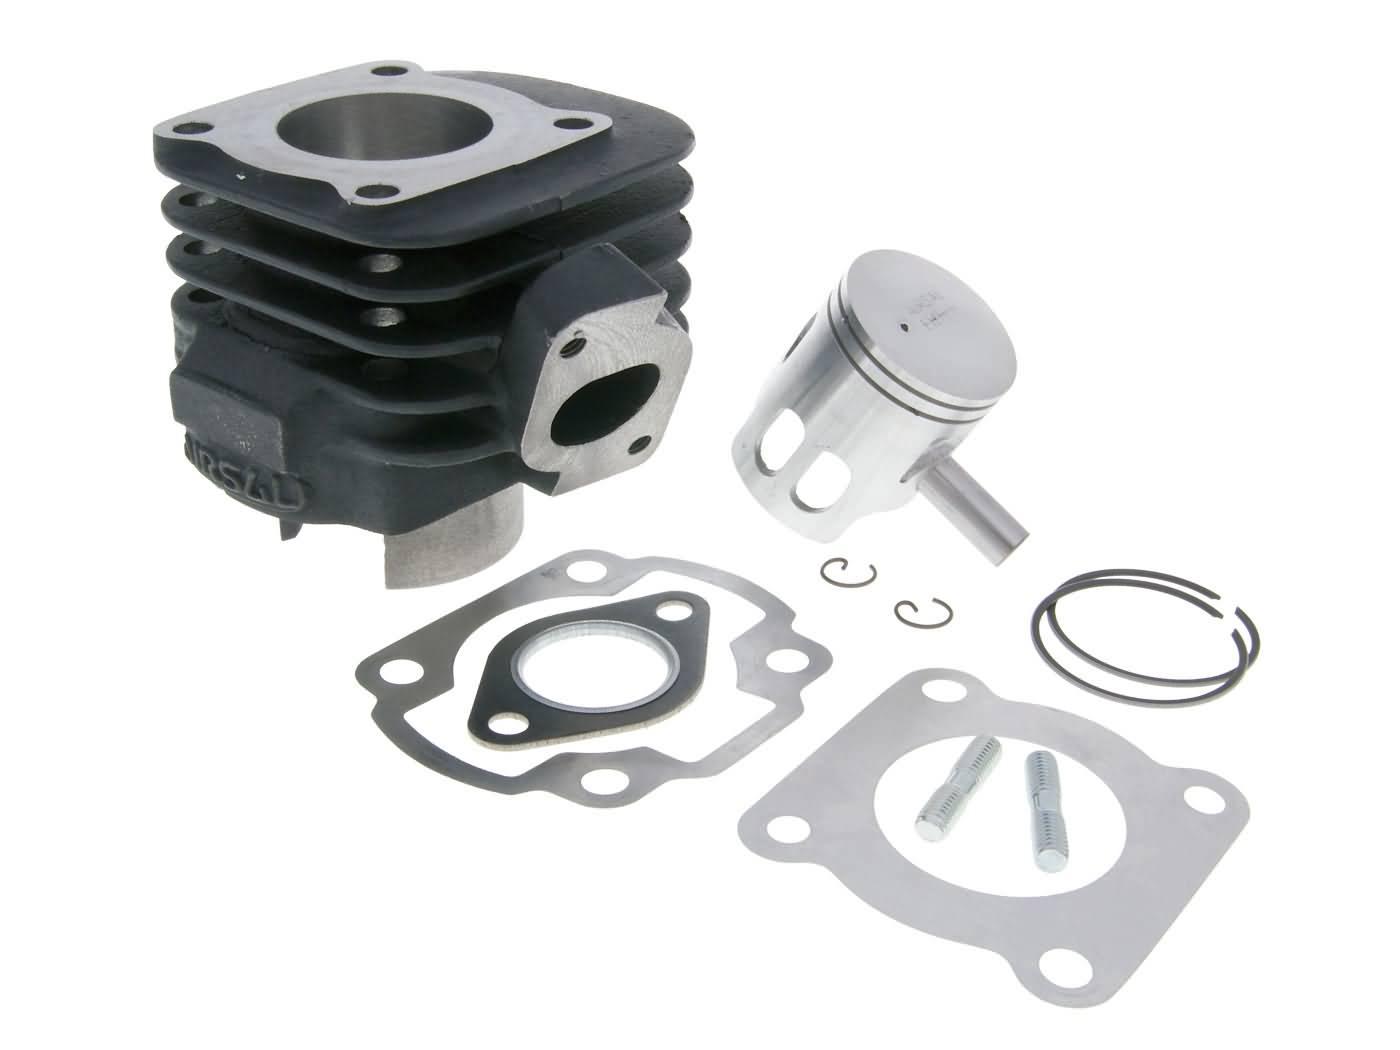 AIRSAL Kit engine cylinder piston complete aluminum AIRSAL 49,2cc